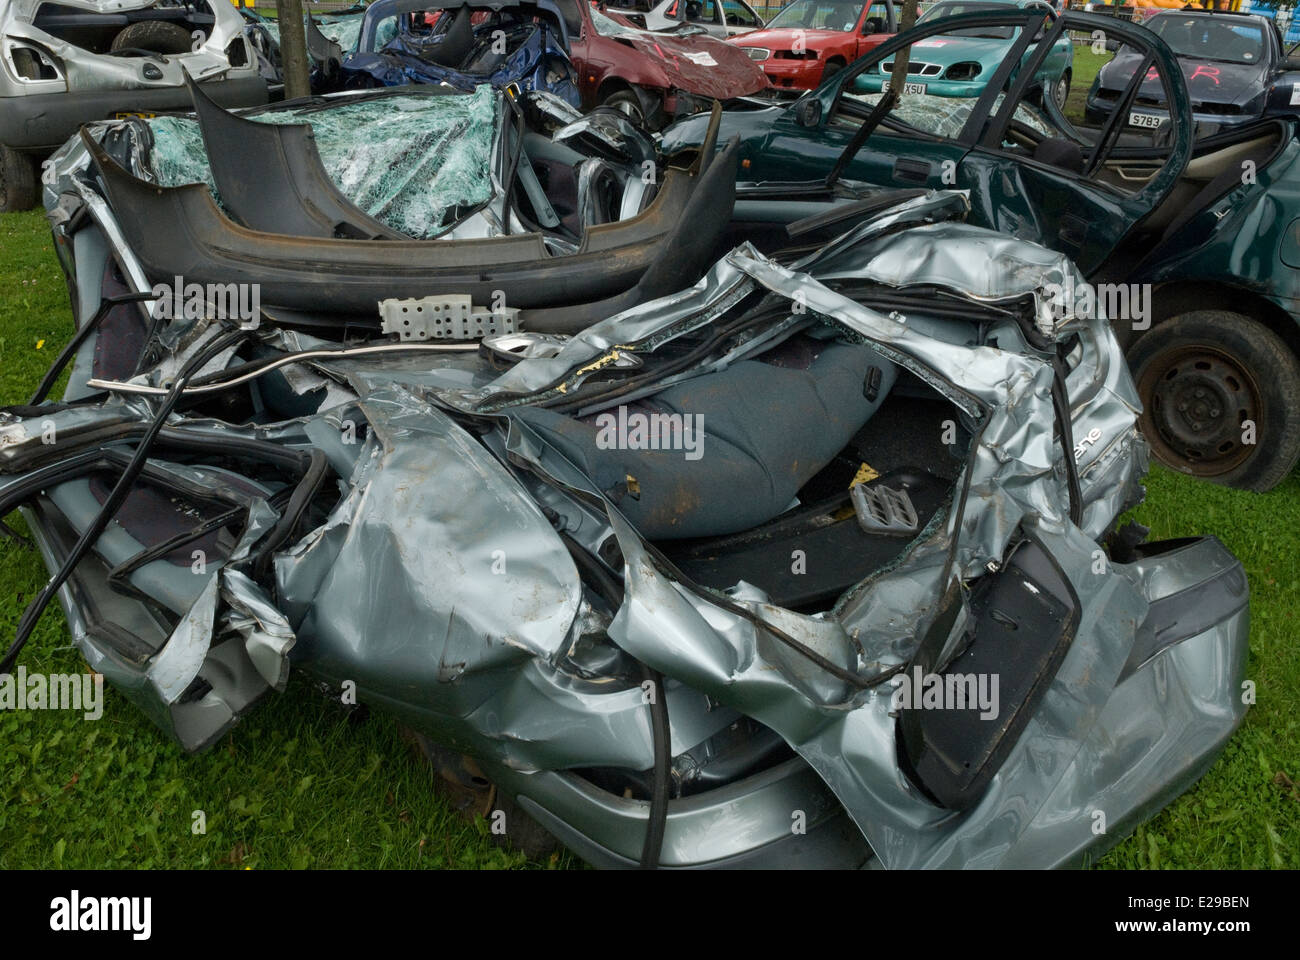 Car Wreckage Glasgow - Stock Image